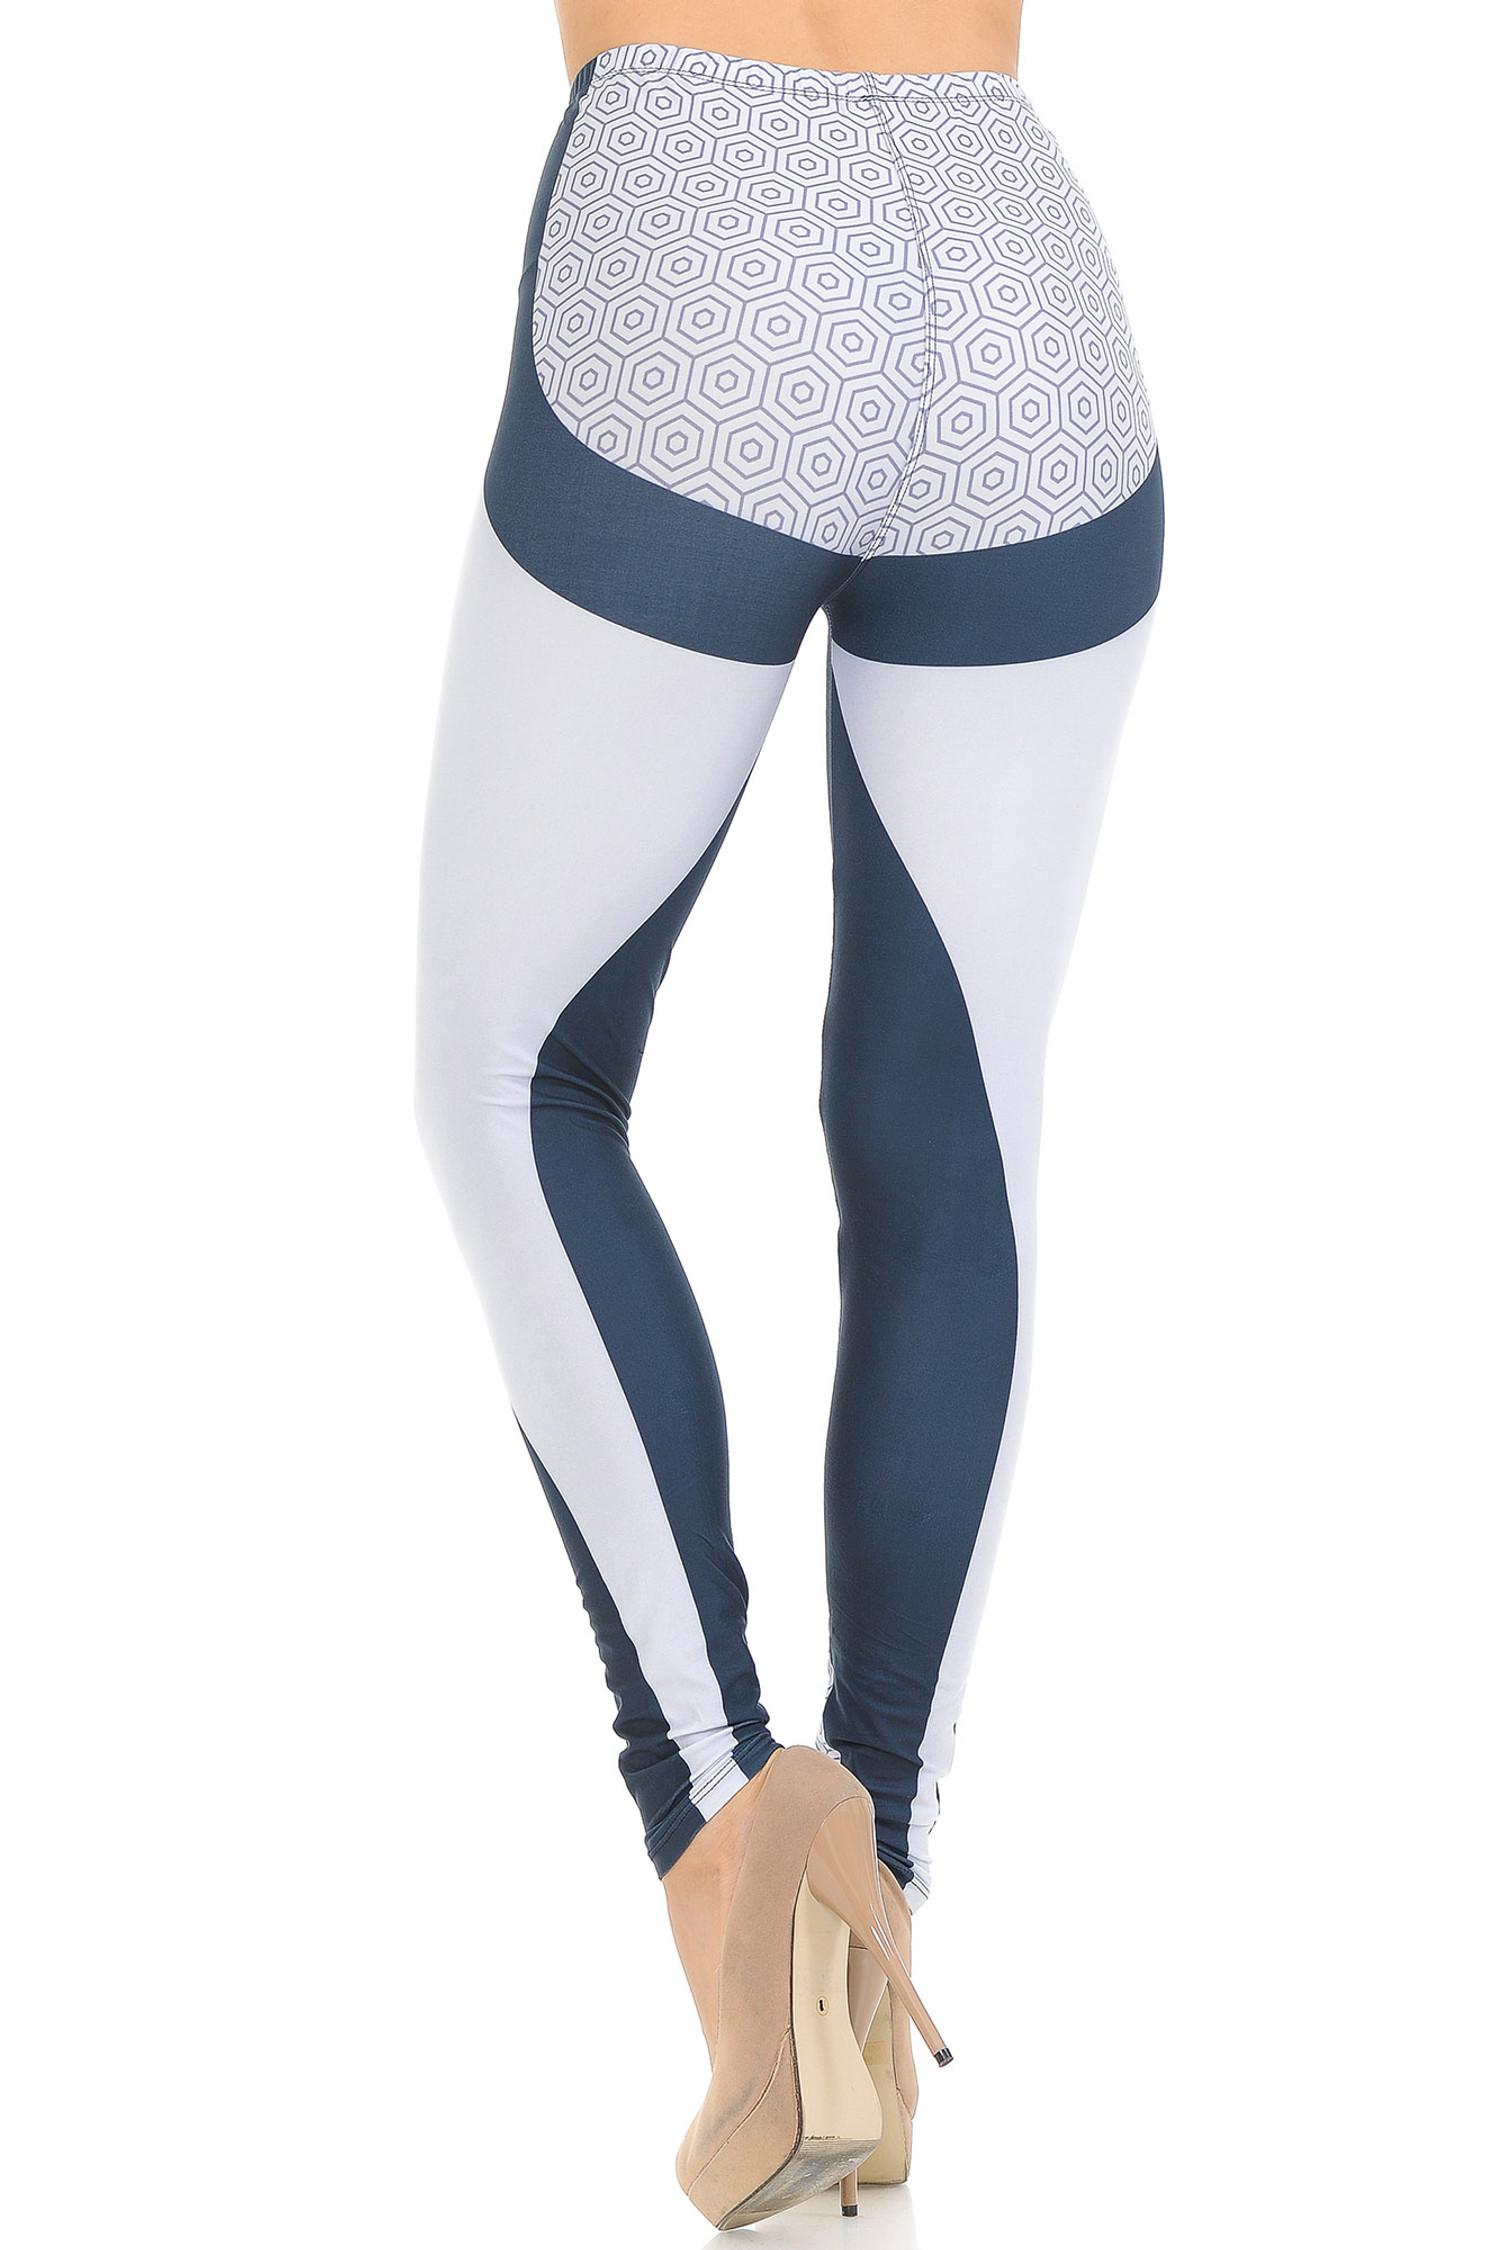 Creamy Soft Contour Curves Extra Small Leggings - USA Fashion™